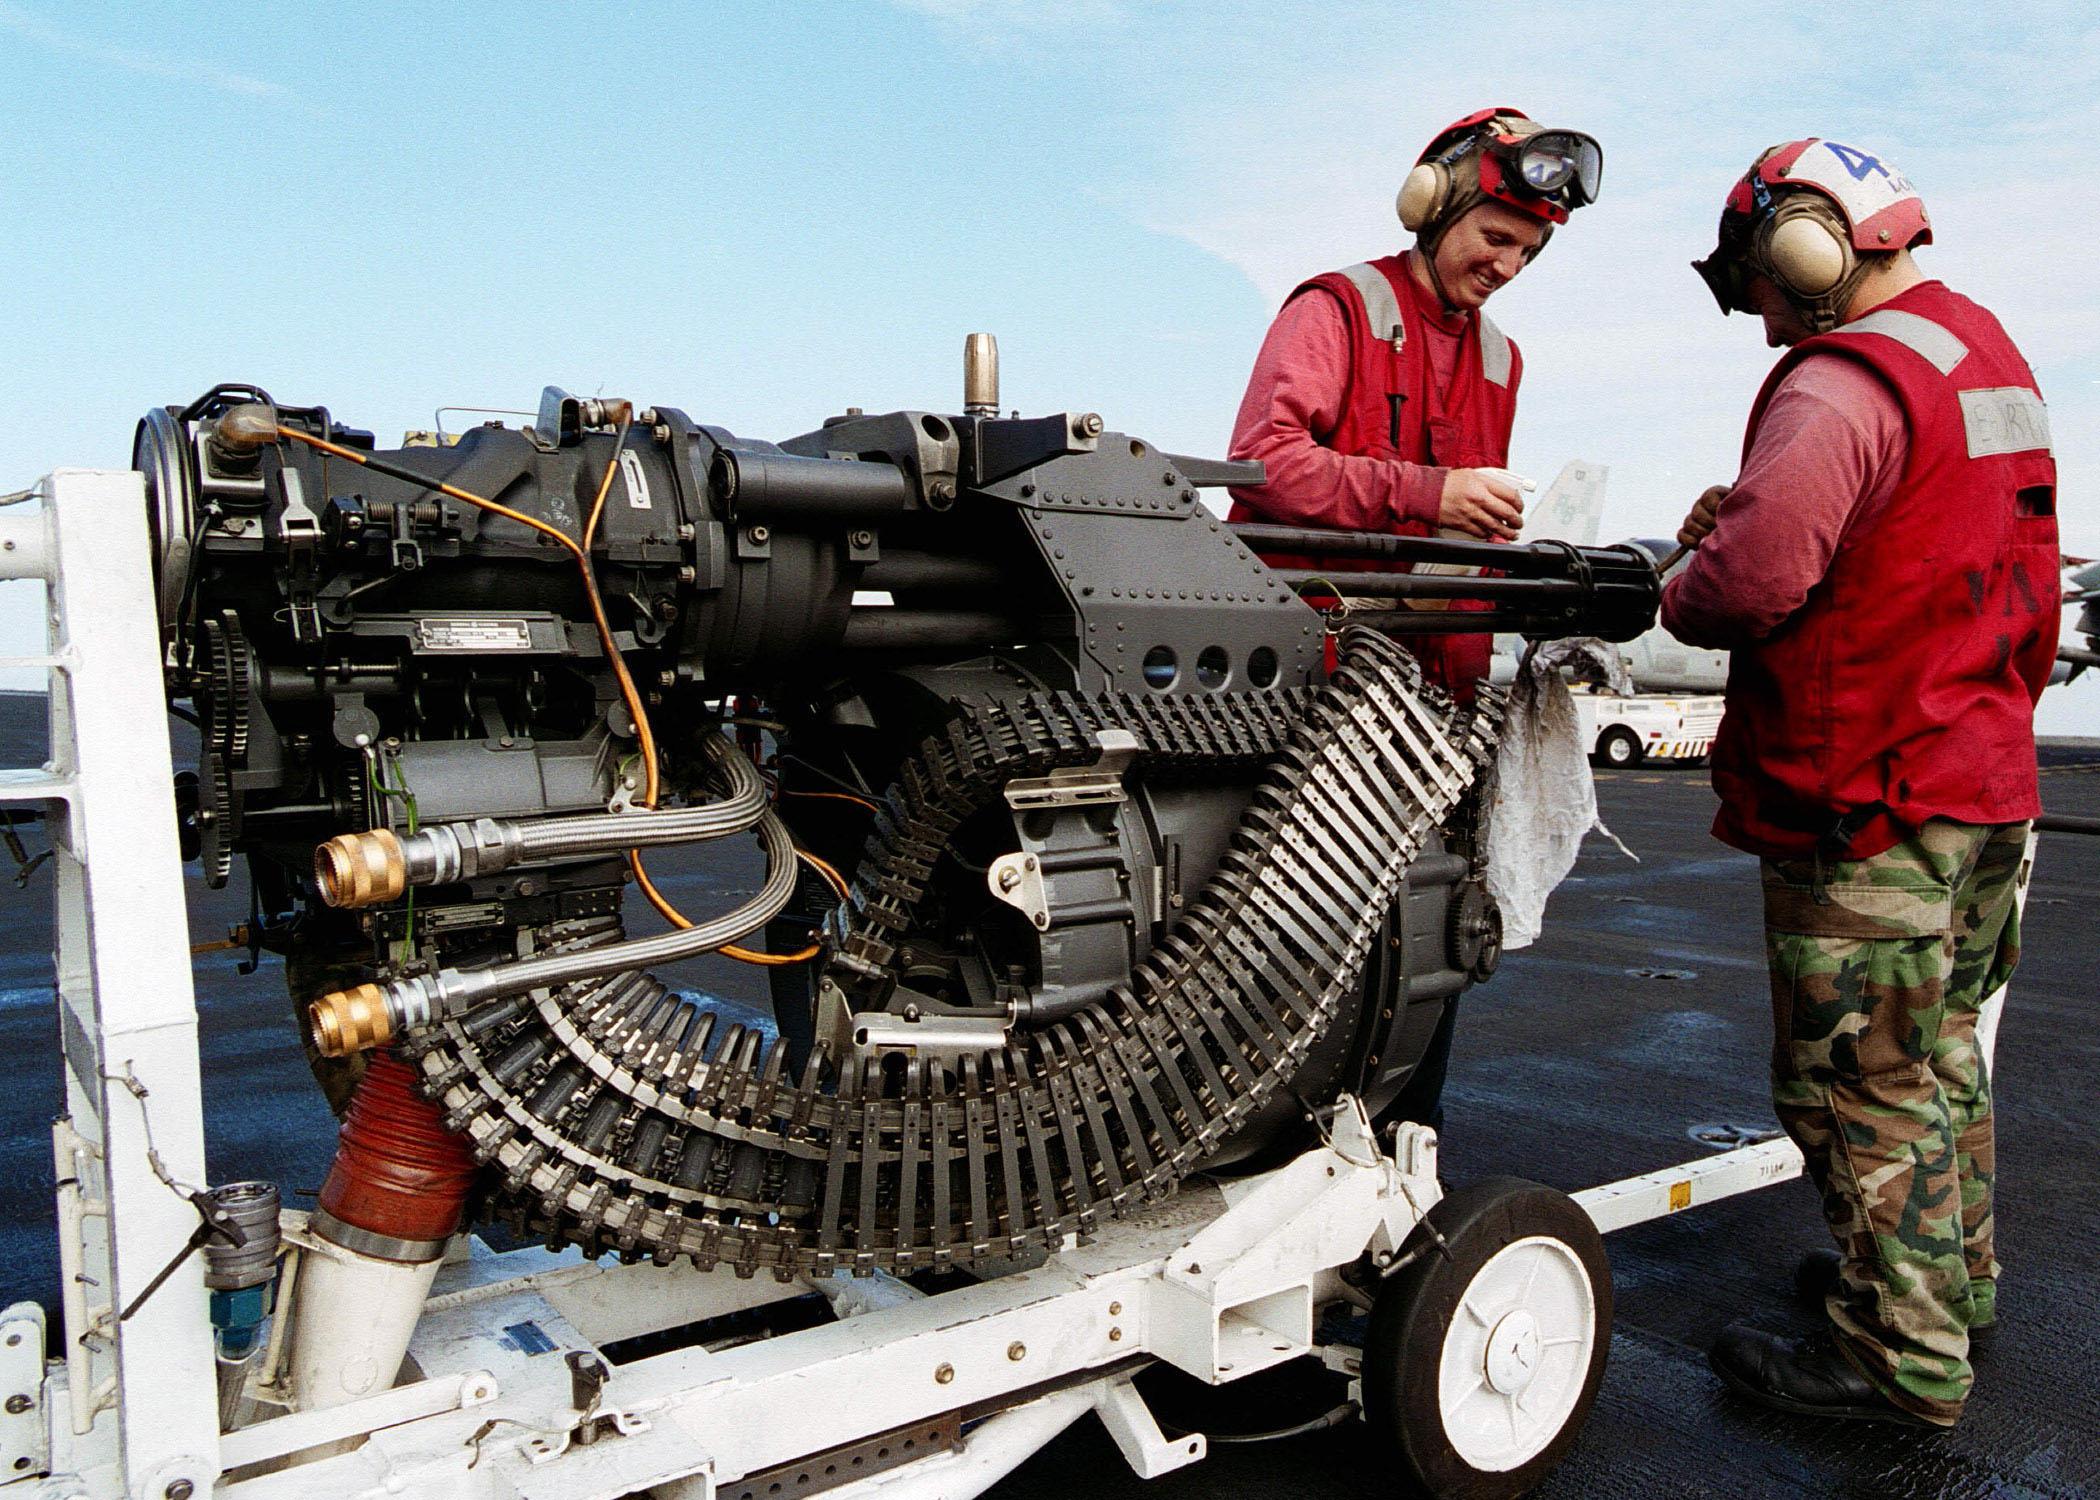 F-16 Armament - M61 A1 Vulcan